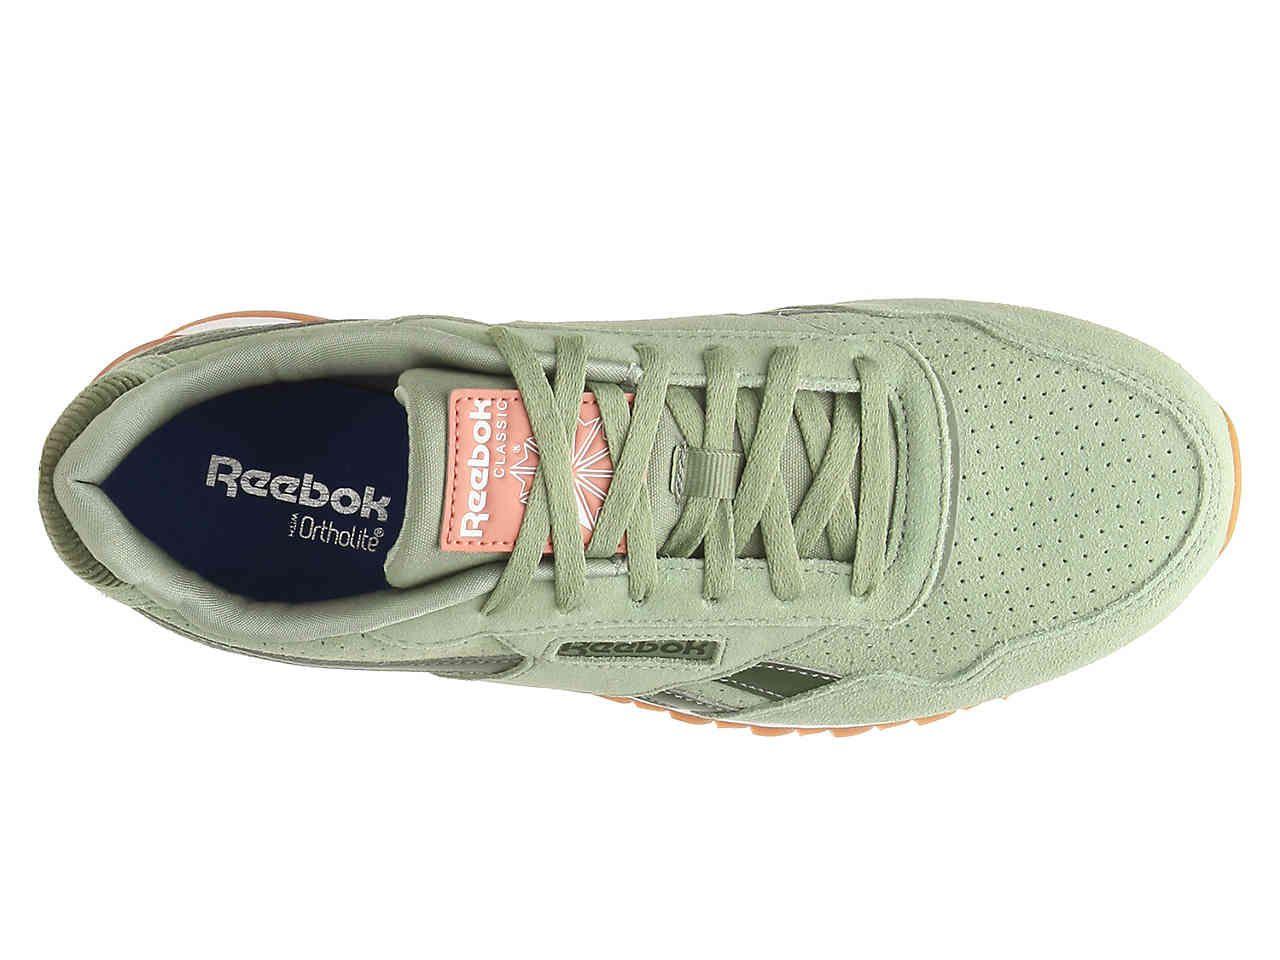 26fc814c40080 Reebok Classic Harman Run Sneaker - Women s Women s Shoes